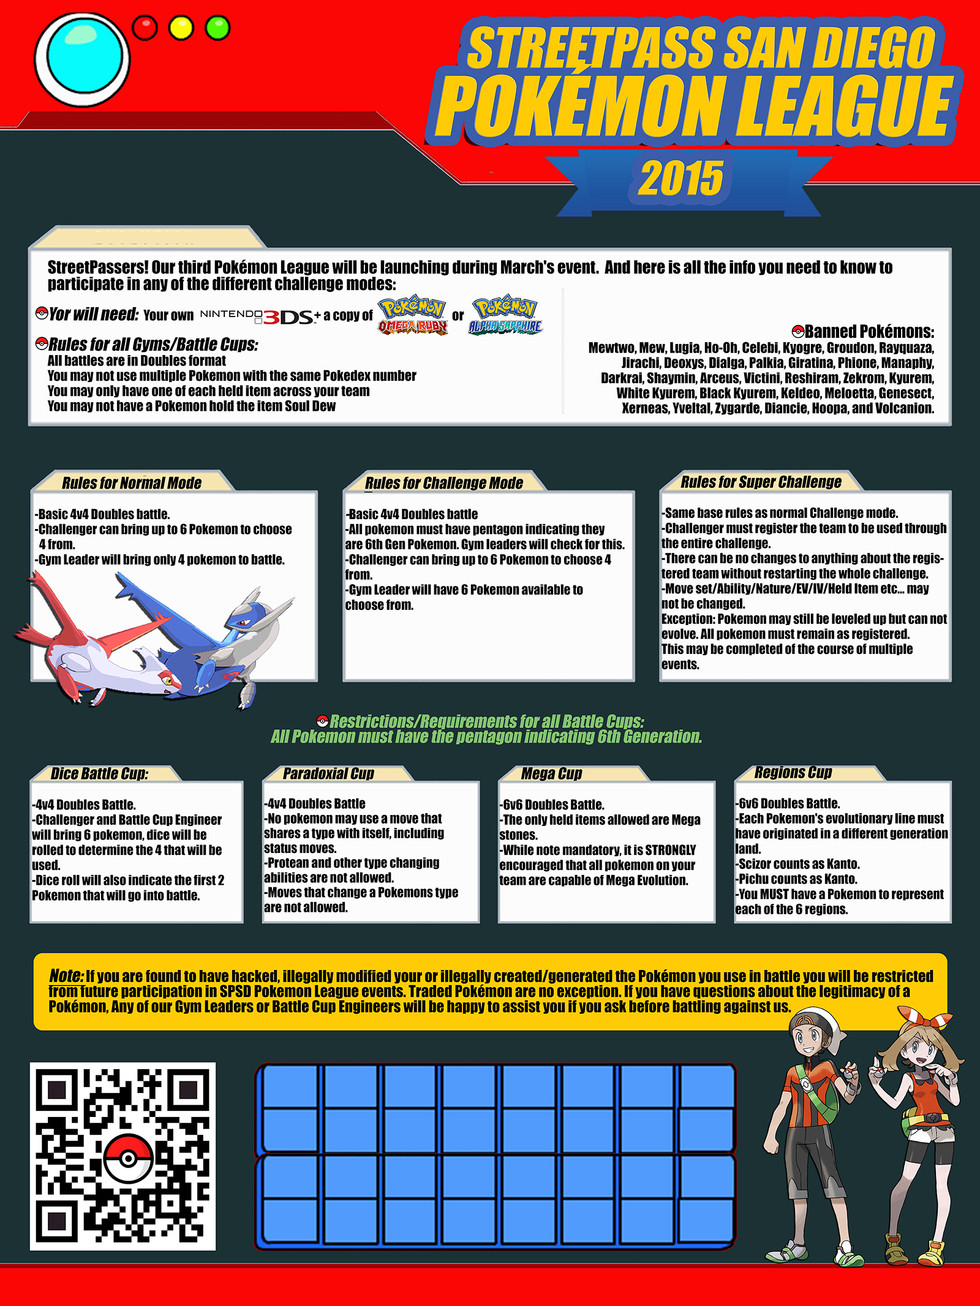 StreetPass San Diego Pokémon League 2015